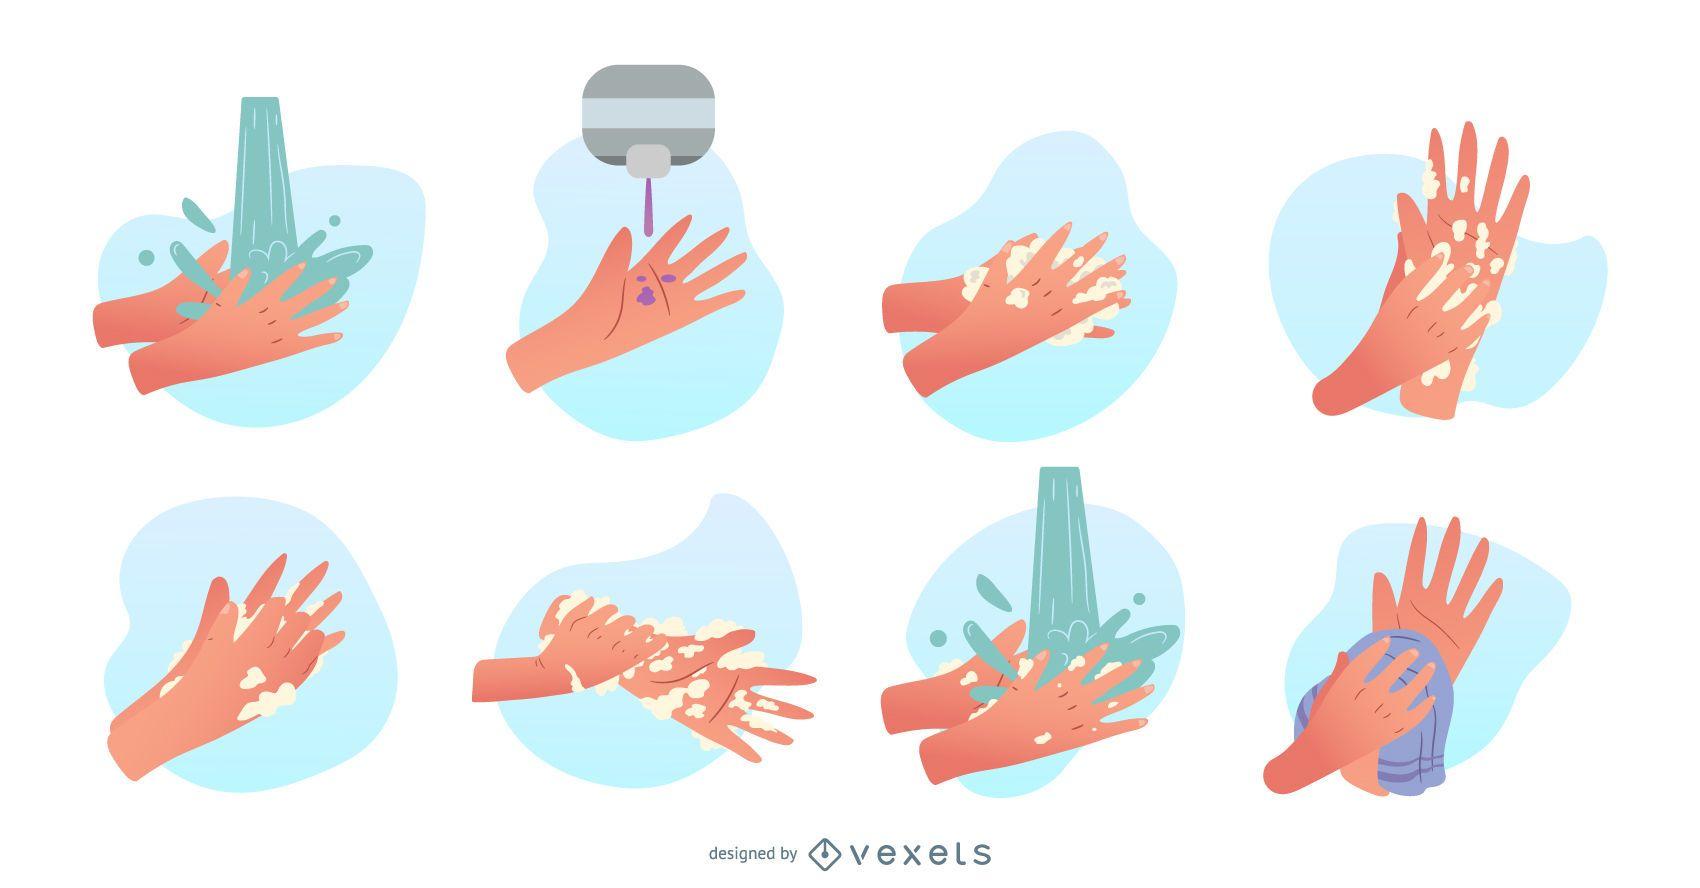 Washing hands illustration set